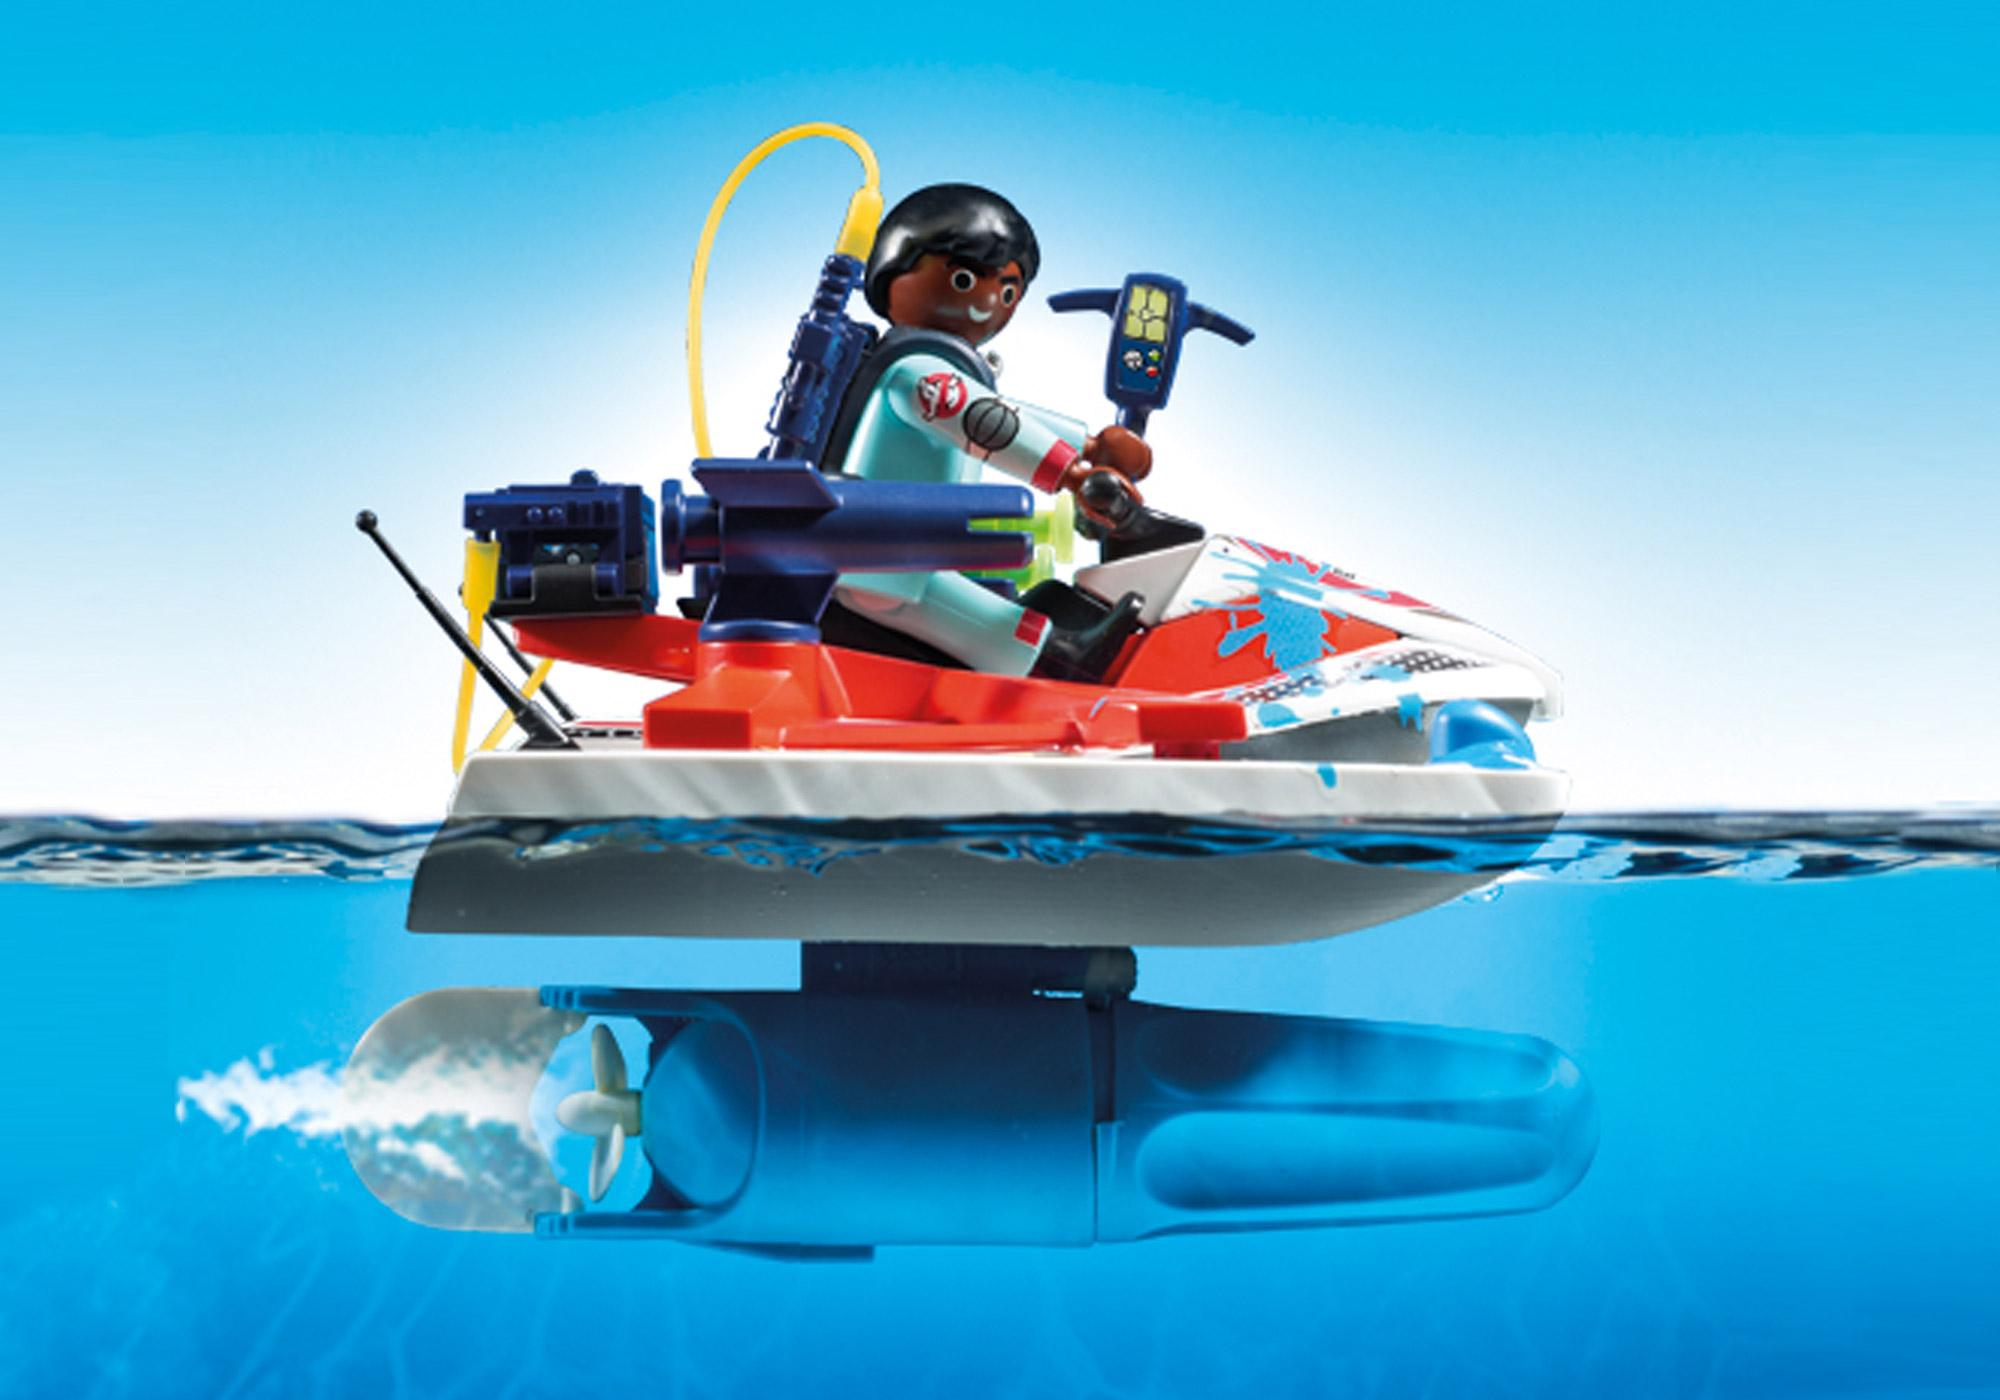 http://media.playmobil.com/i/playmobil/9387_product_extra3/Zeddemore met waterscooter